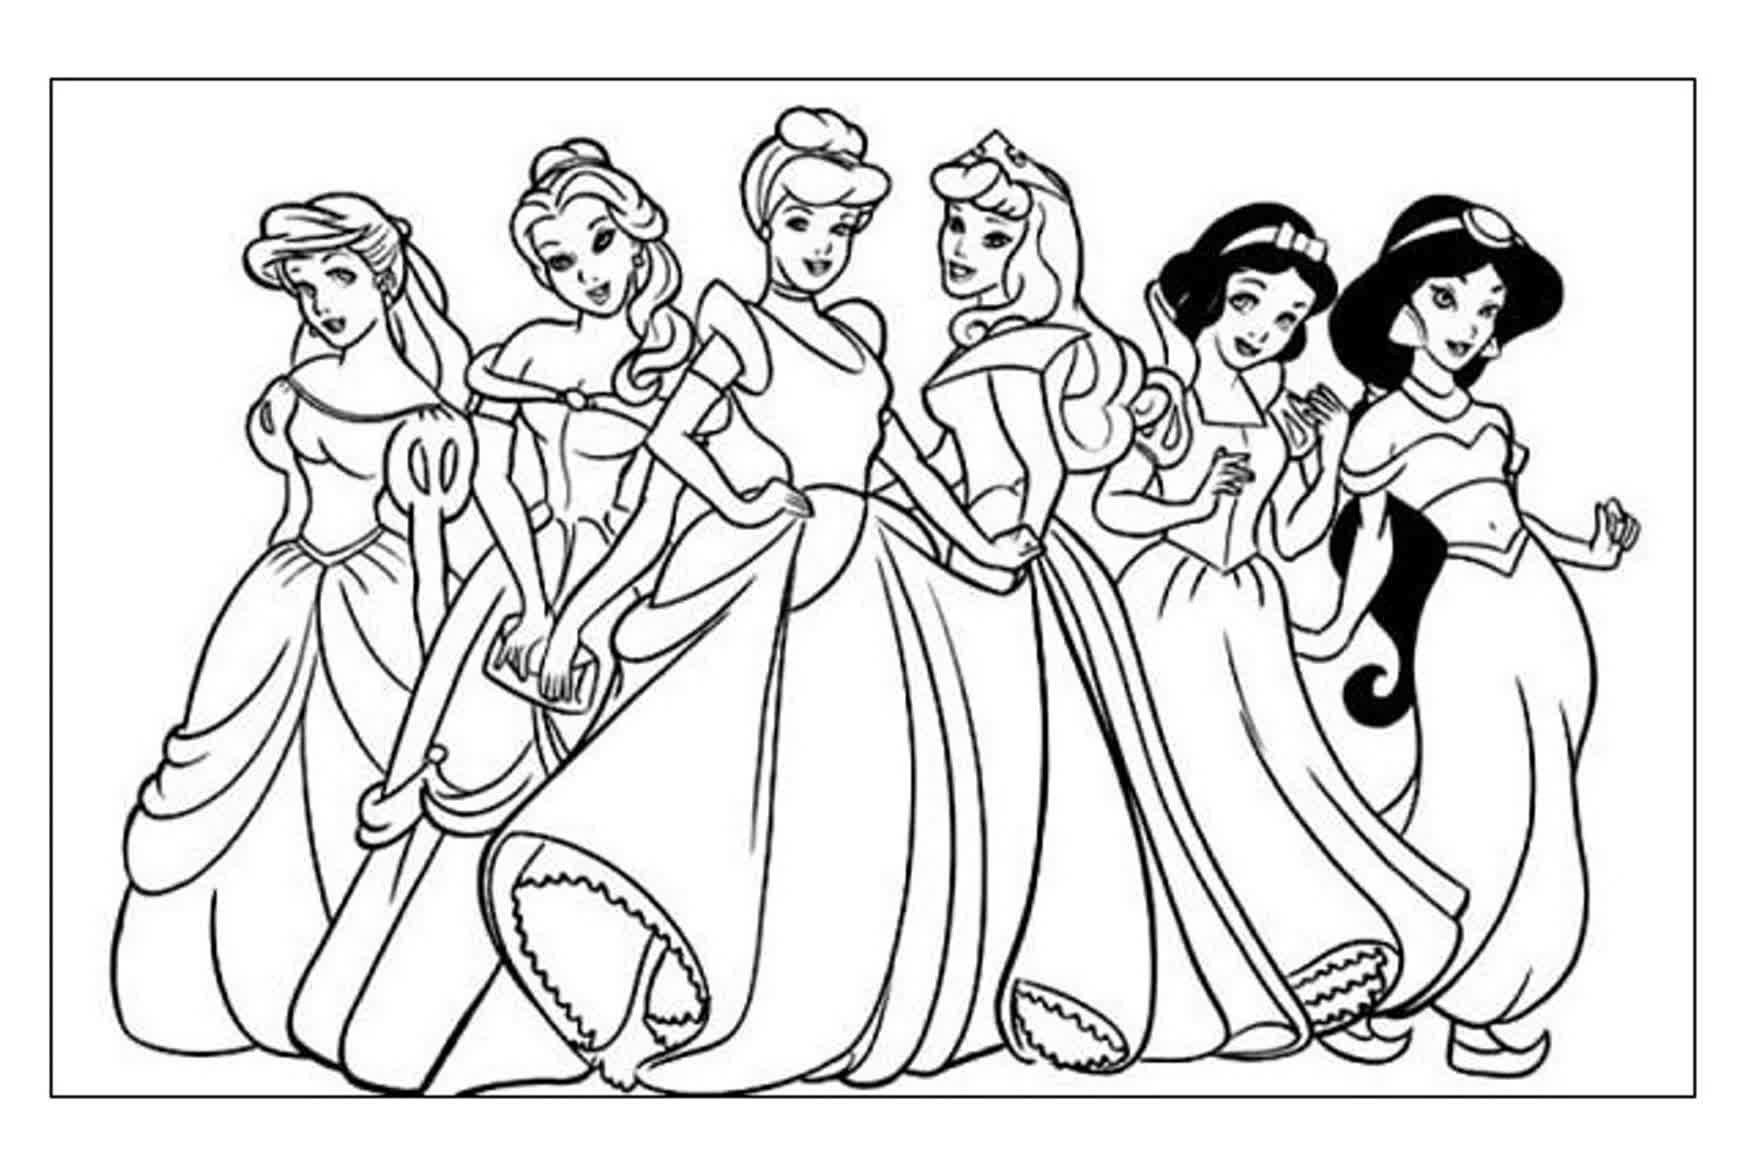 Walt Disney Da Colorare.Disegni Da Colorare Walt Disney Principesse Fresco Disegni Da